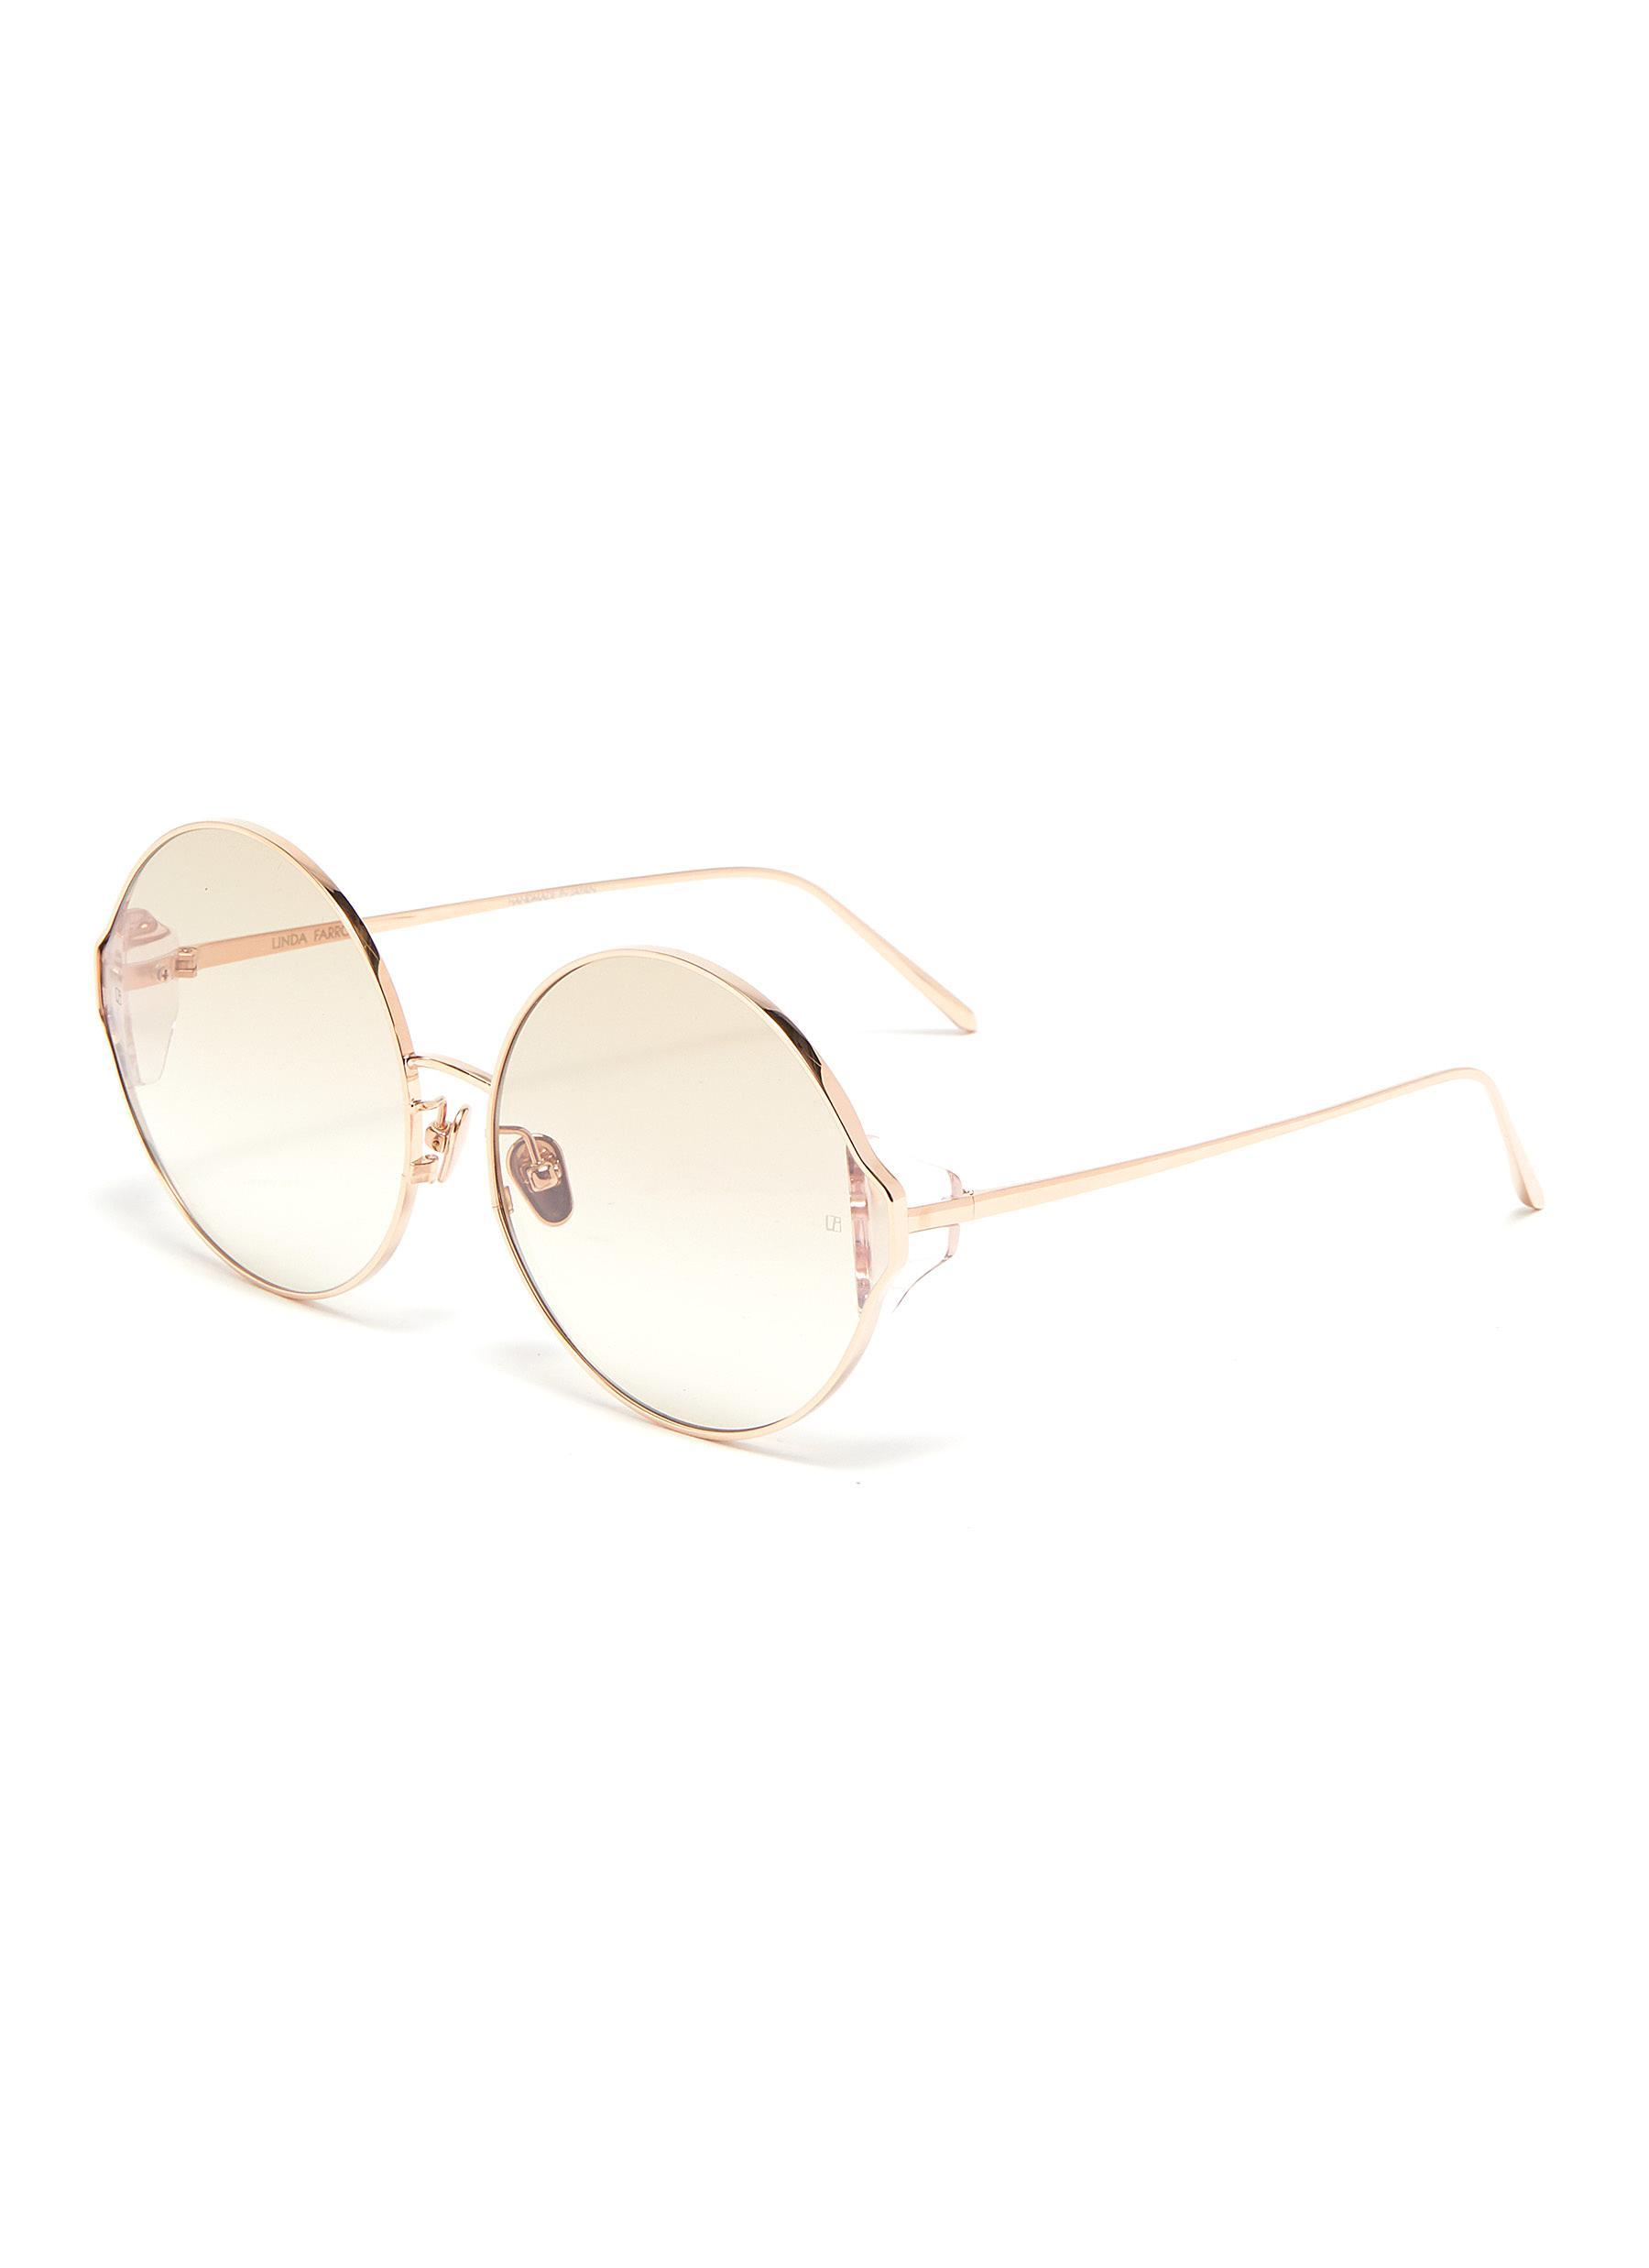 Linda Farrow Acetate Corner Metal Oversized Round Sunglasses In Rose Gold / Blush